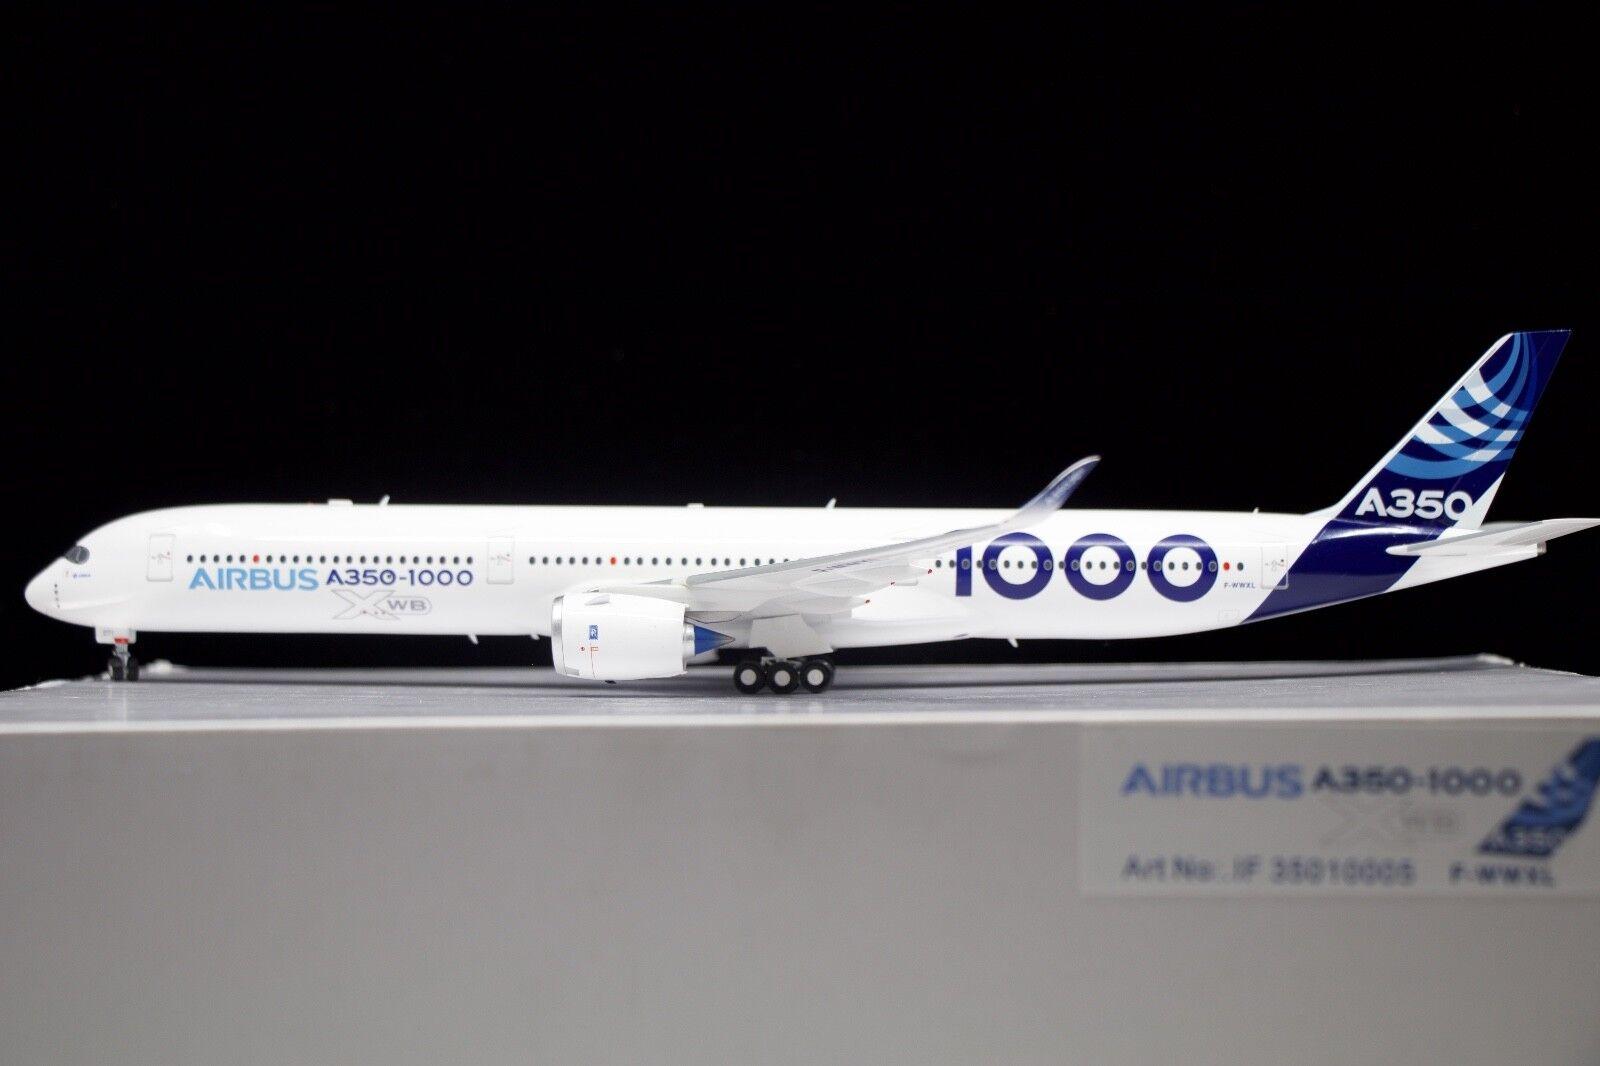 Inflight 200 Colores Casa de Airbus A350-1000 F-wwxl Edición Limitada